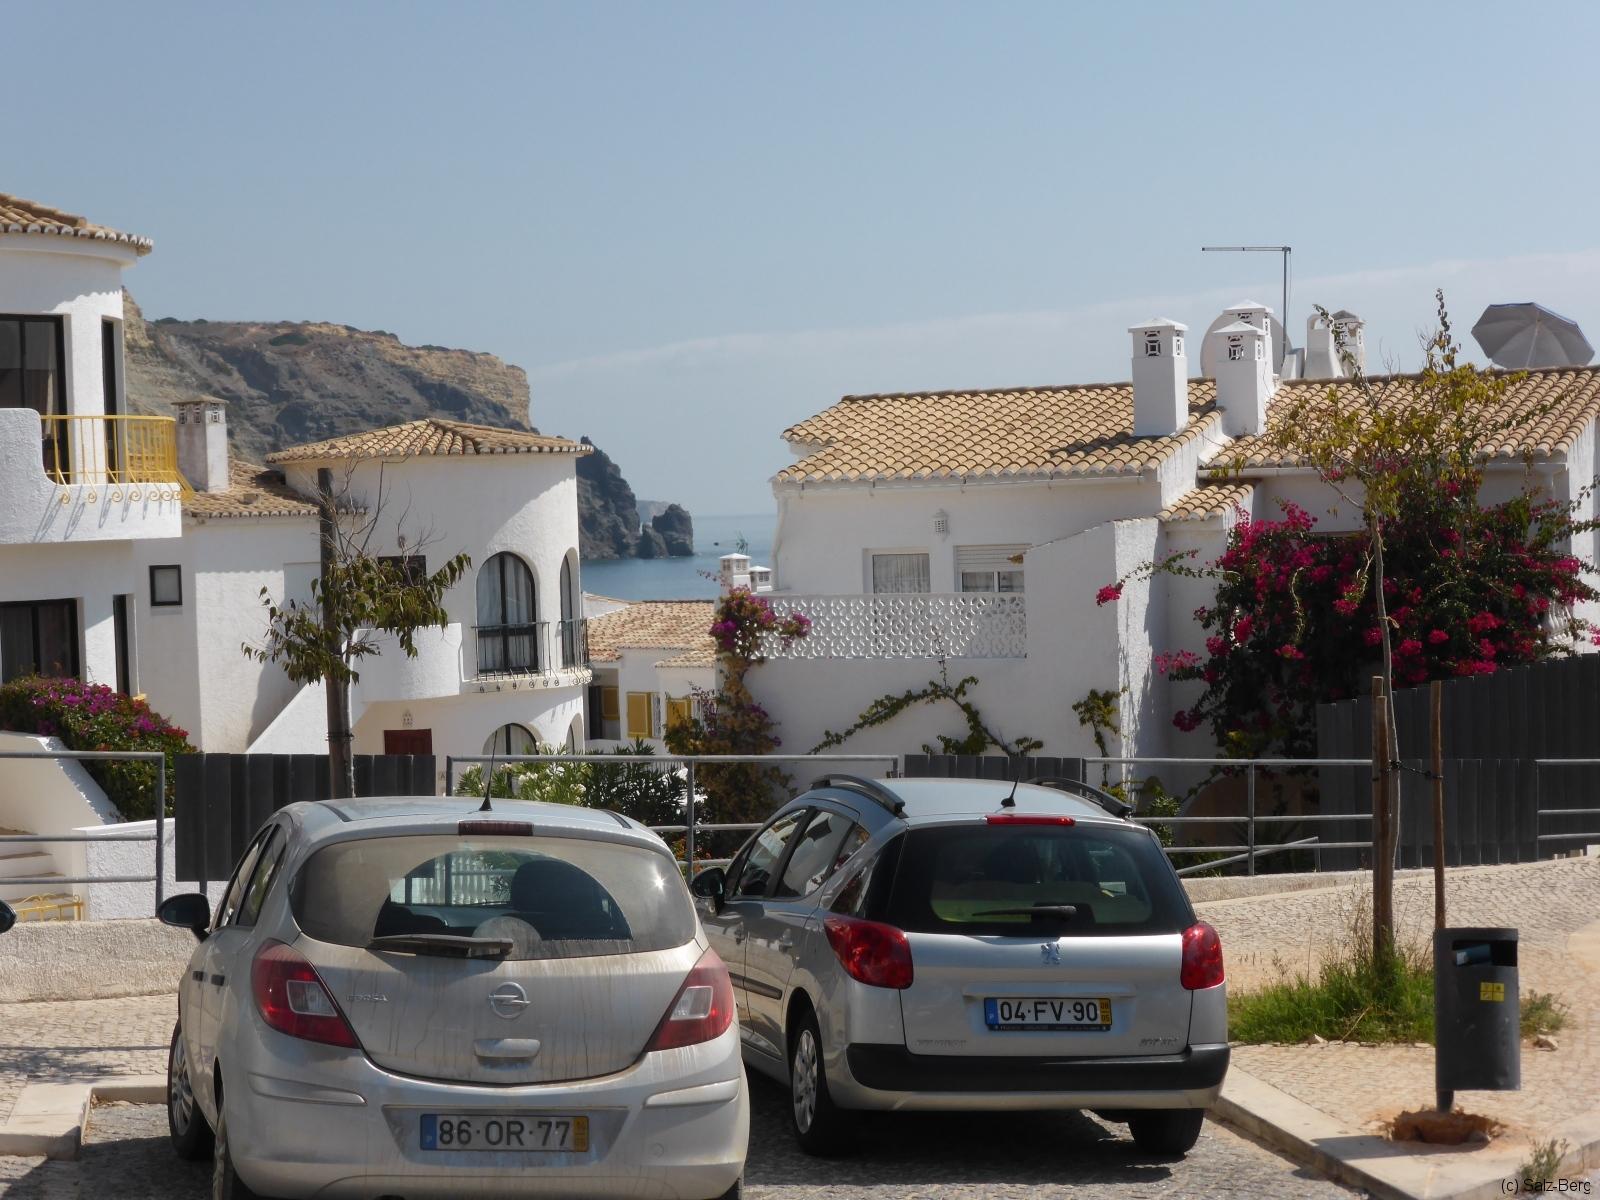 Algarve-491-P1050932